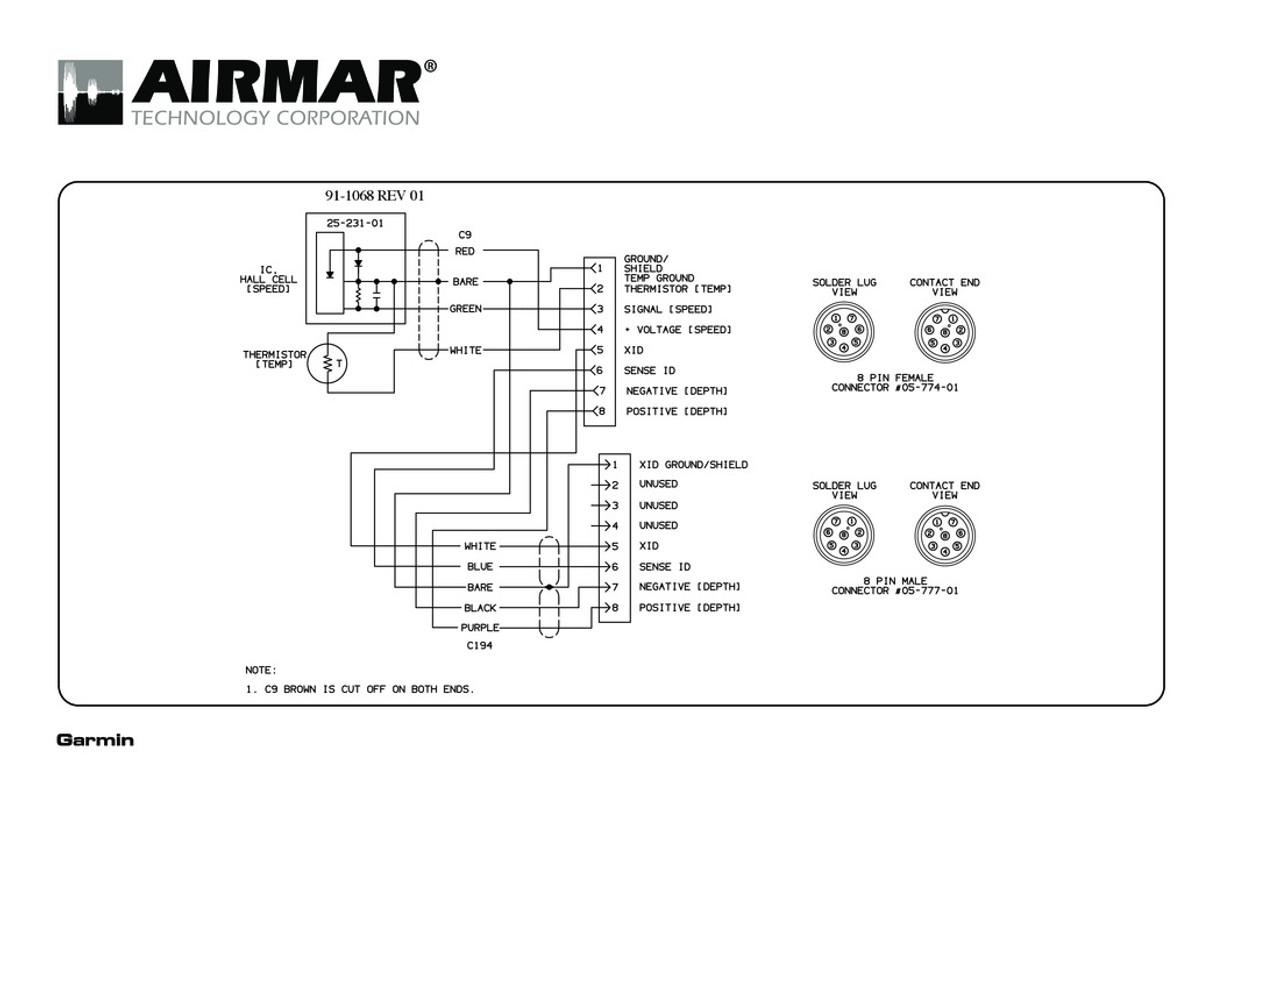 hight resolution of airmar wiring diagram garmin st850 8 pin s t blue bottle marine 4 pin din plug garmin 4 pin wiring diagram